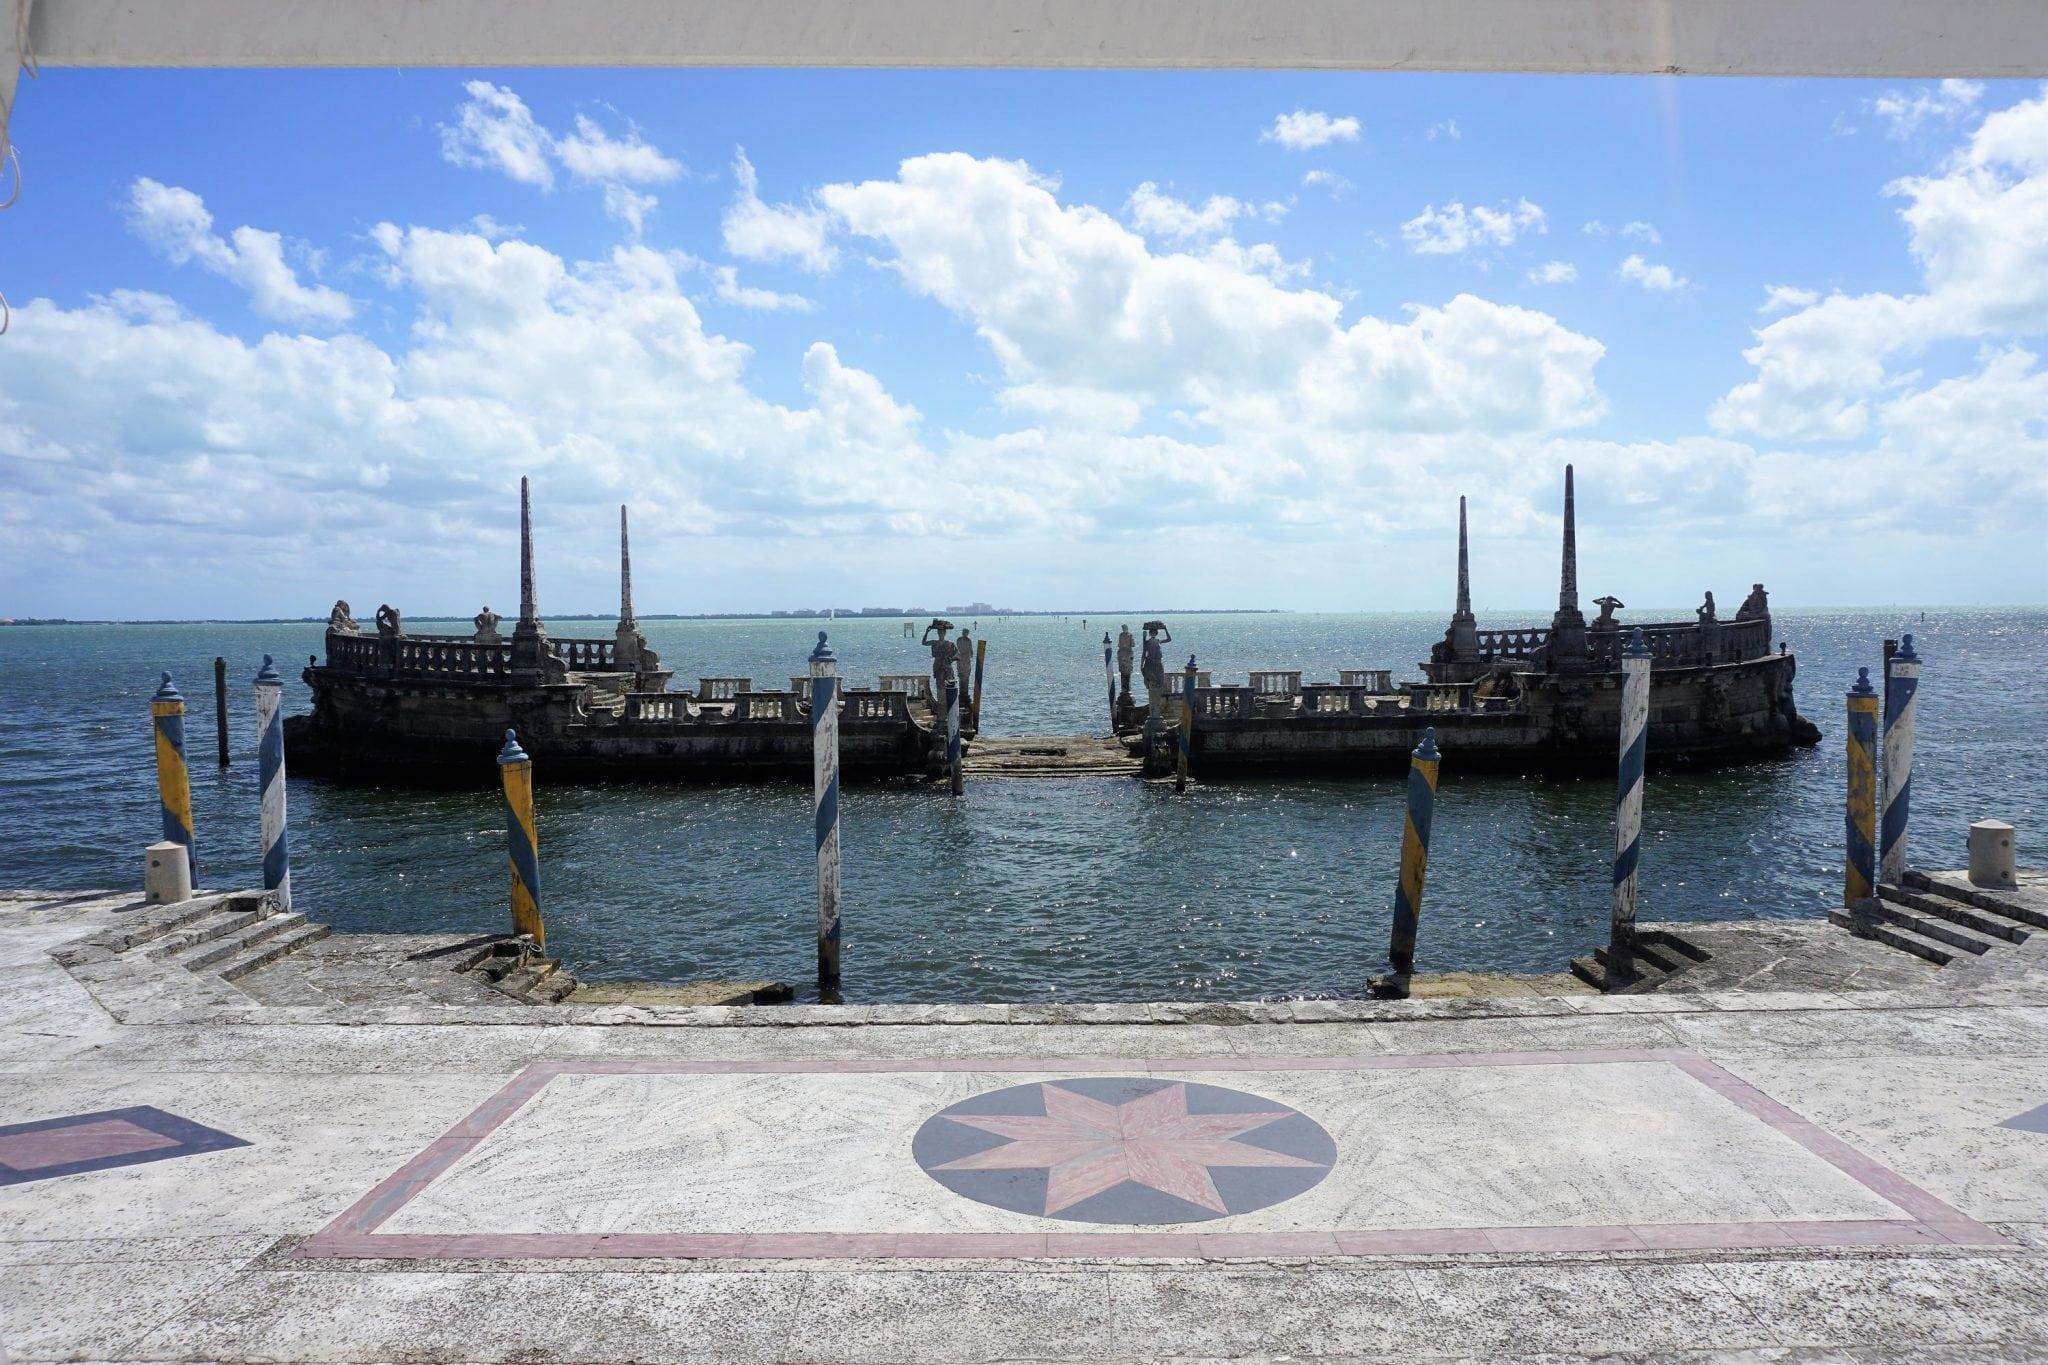 Nowegian Getaway Cruise Review